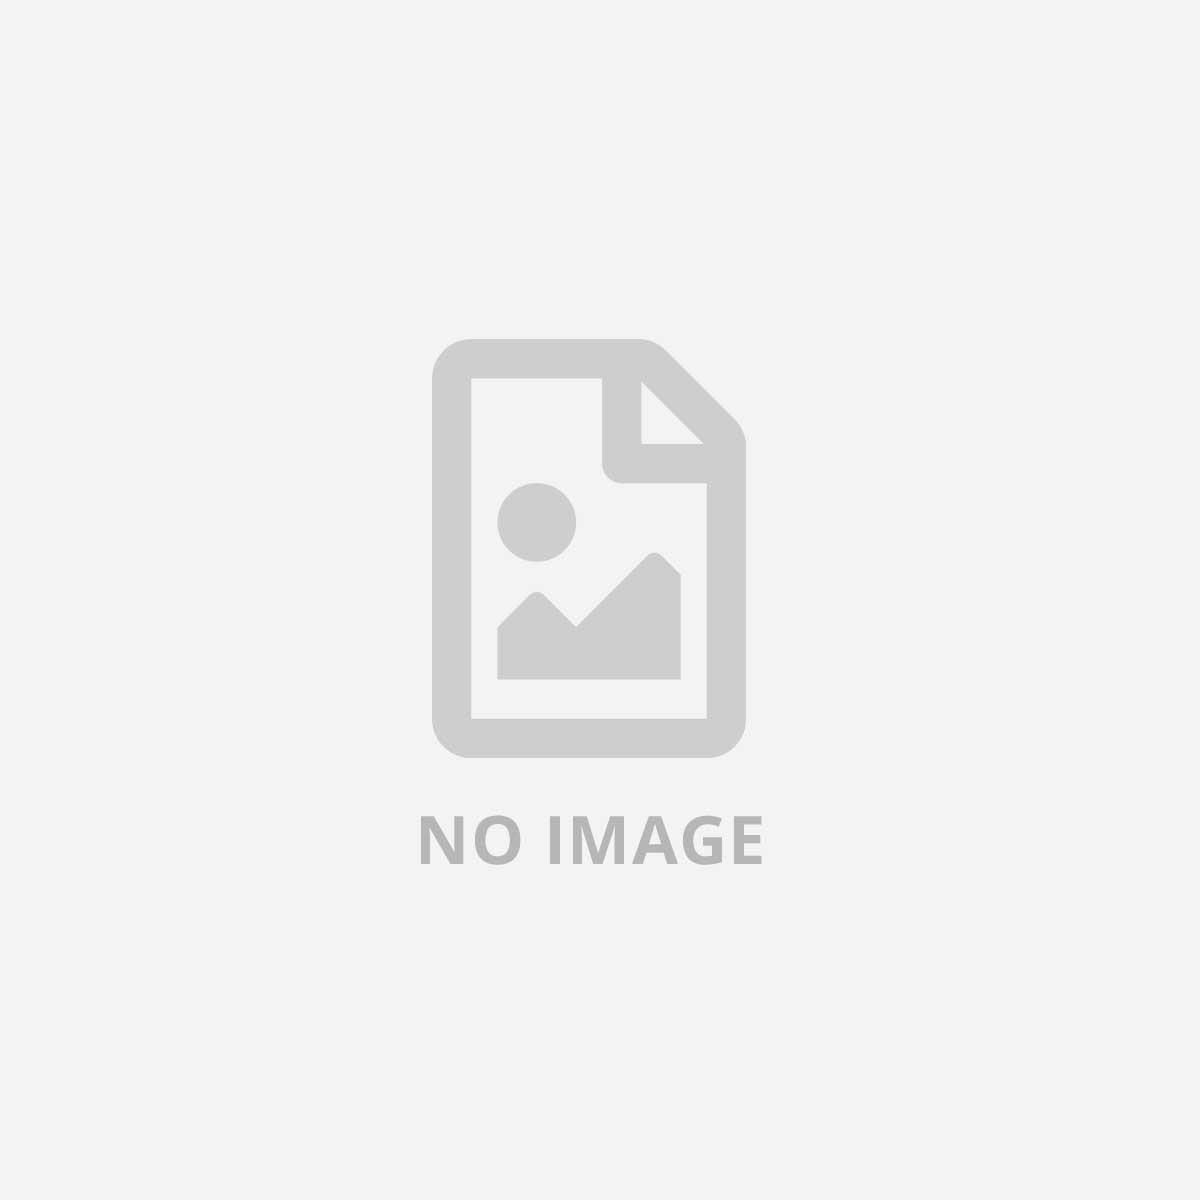 STRONG 24 HD READY C400 12/220V